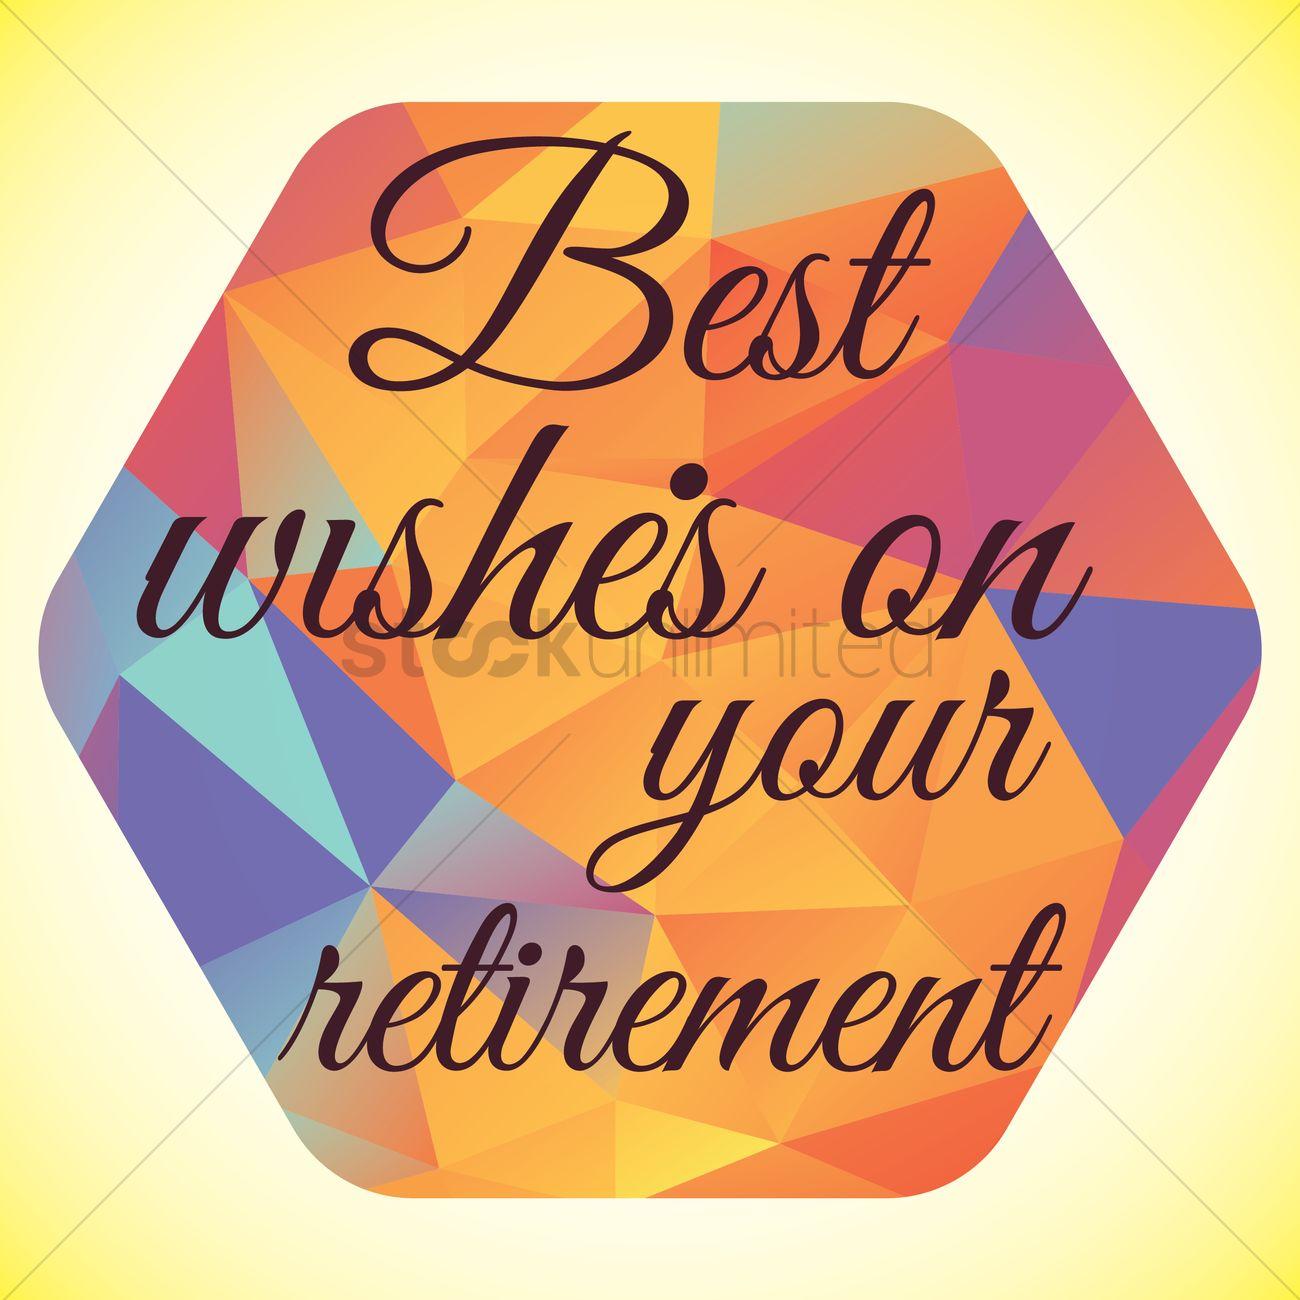 Happy retirement wish vector image 1827610 stockunlimited happy retirement wish vector graphic kristyandbryce Images